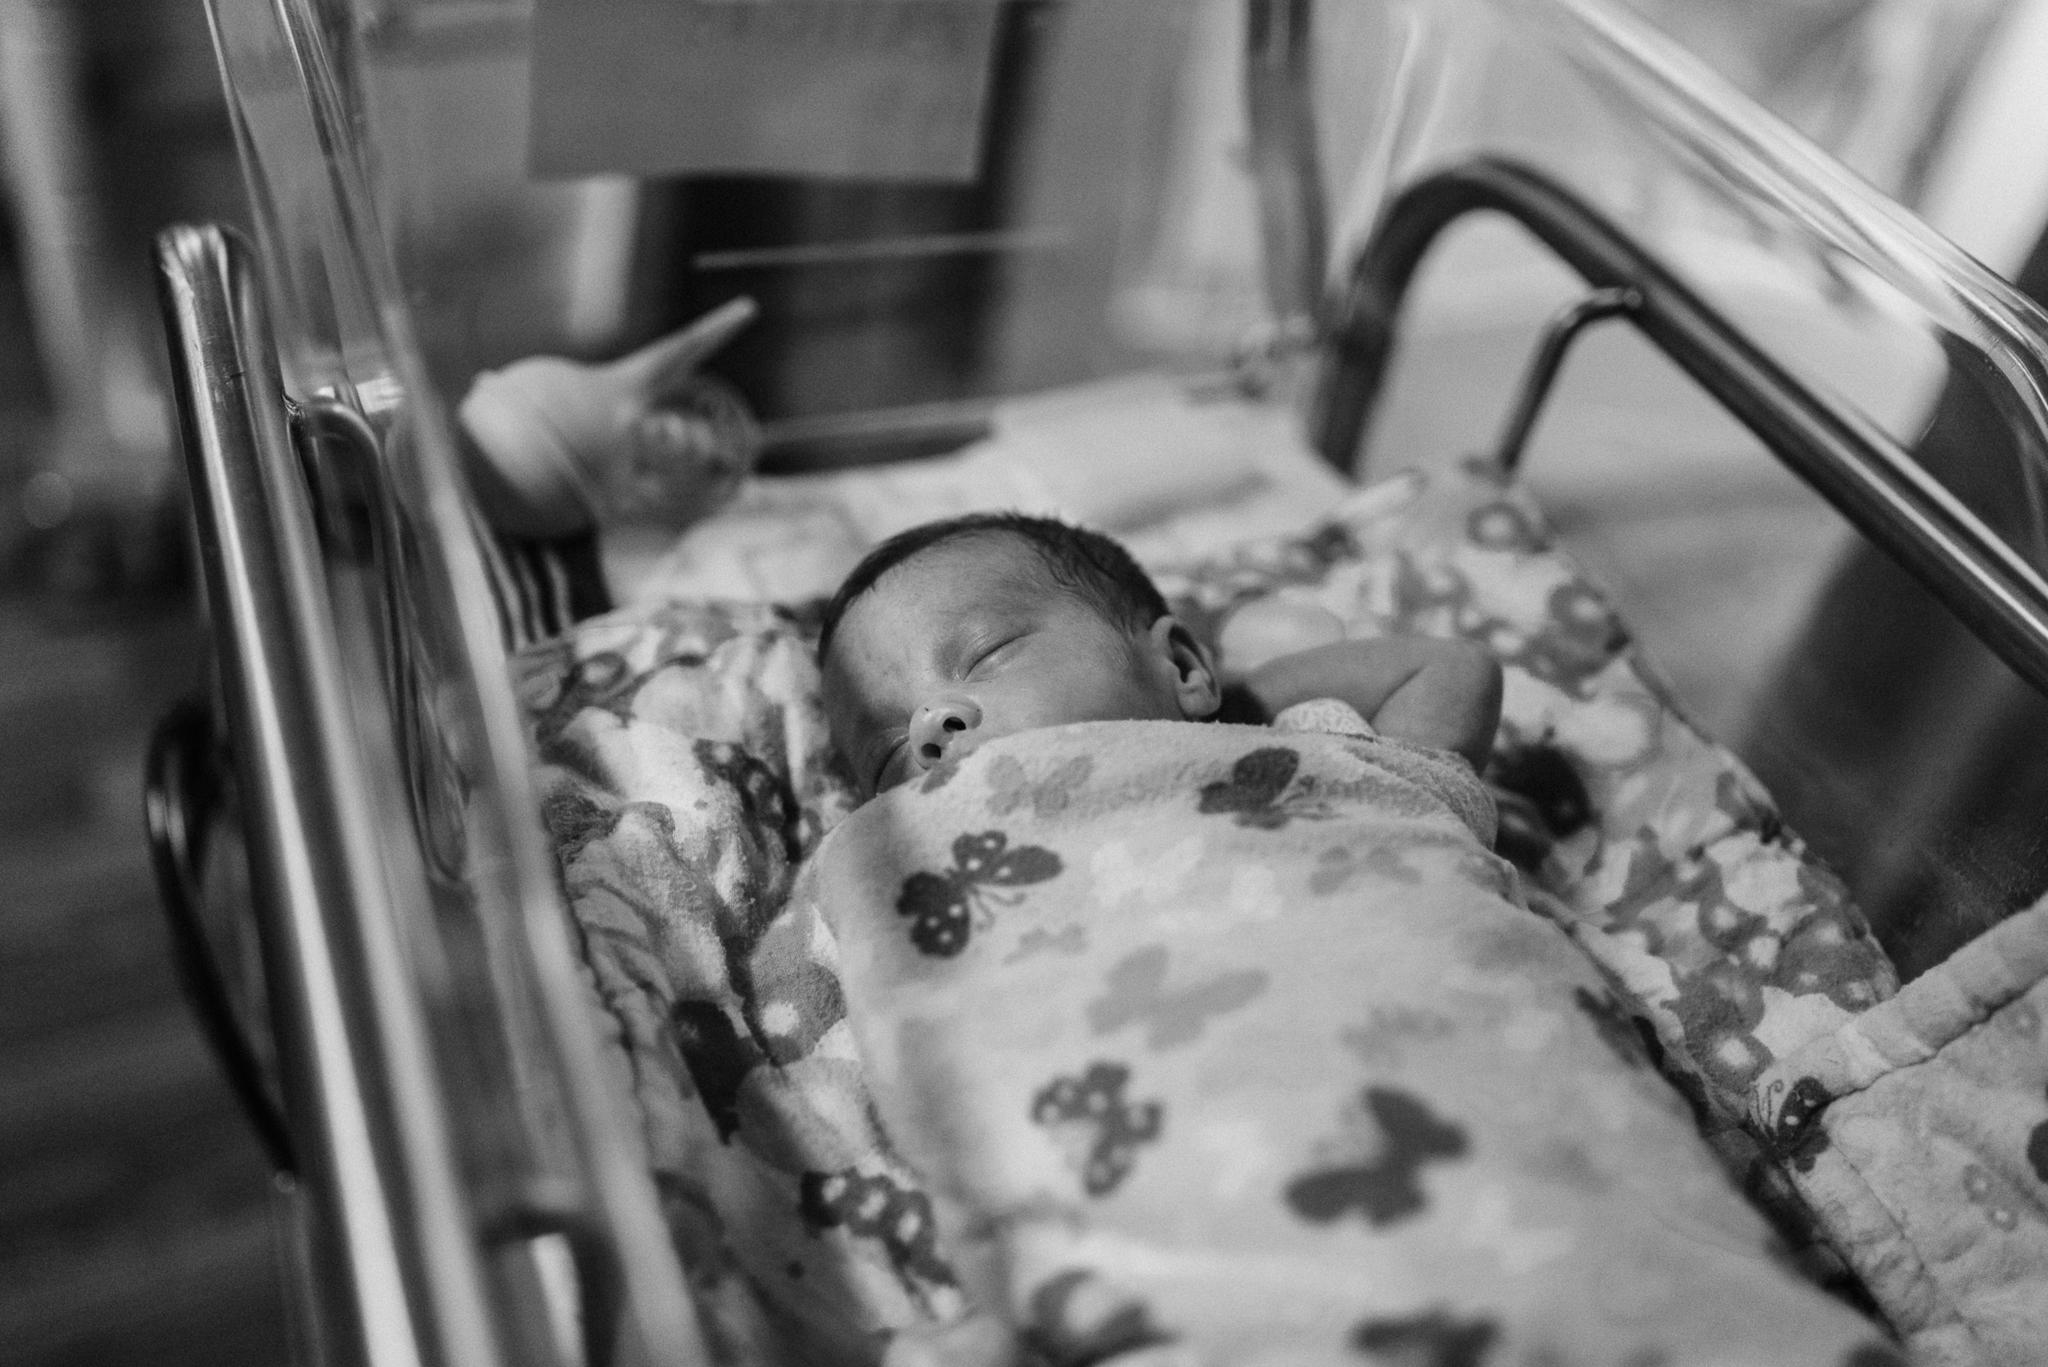 Round Rock Newborn Photographer_Emily Ingalls Photography_ Pflugerville Newborn Photographer_Family Photographer_Round Rock Photographer_Austin Photographer_Pflugerville Photographer_Hutto Photographer-11.jpg